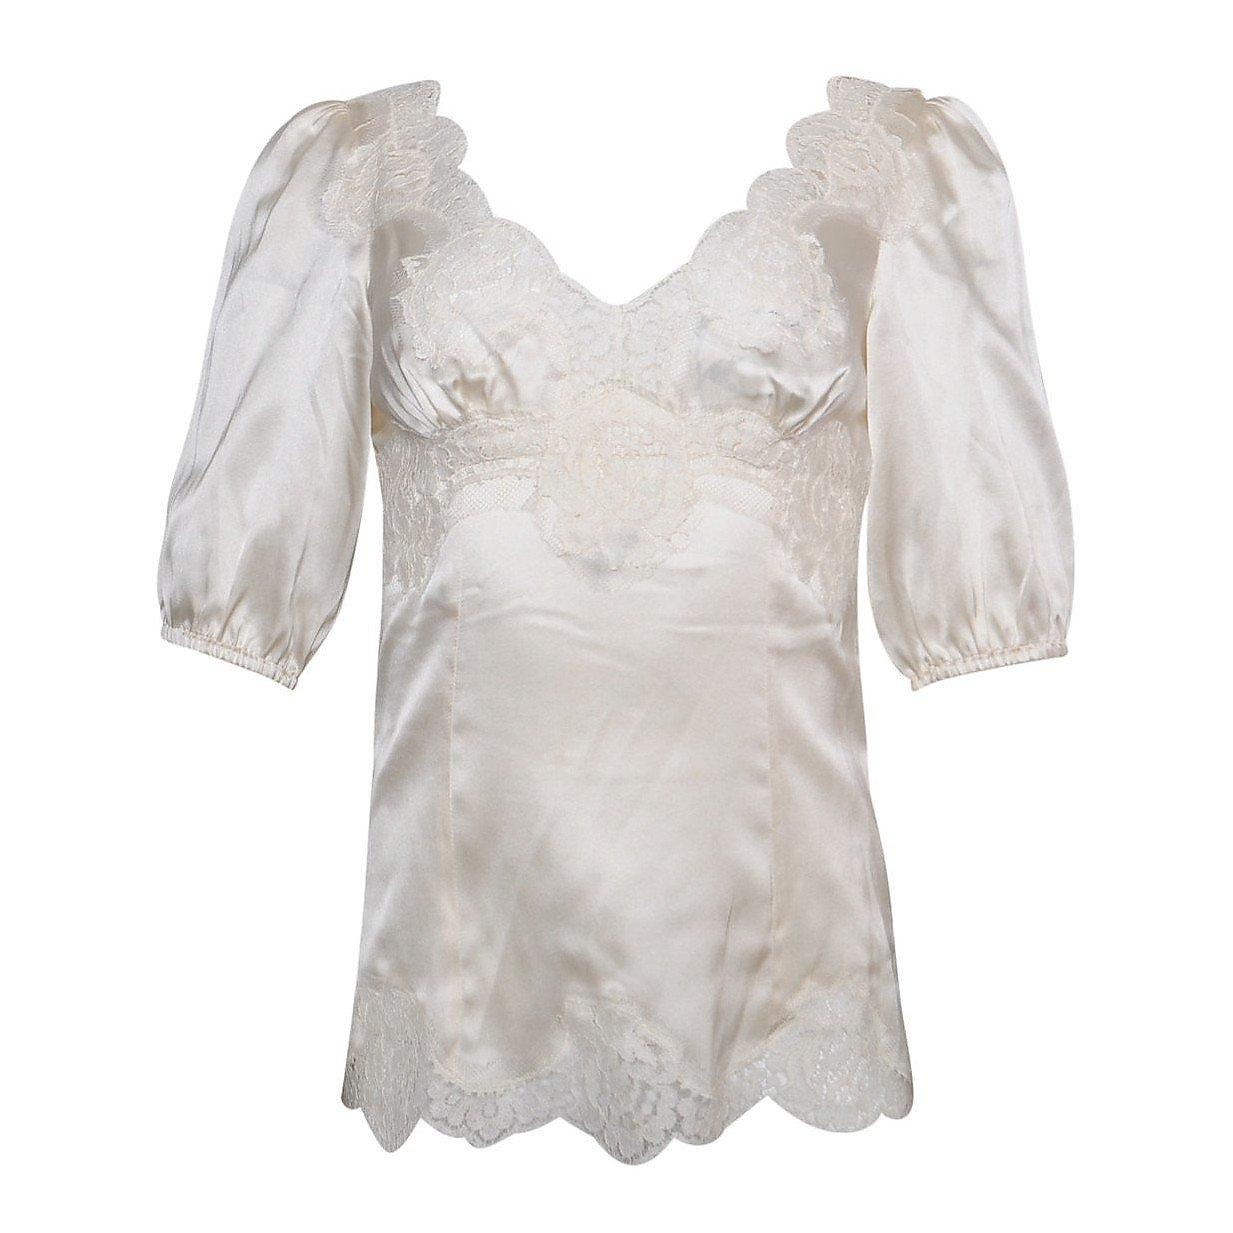 PRADA Lace-Trimmed Silk Blouse